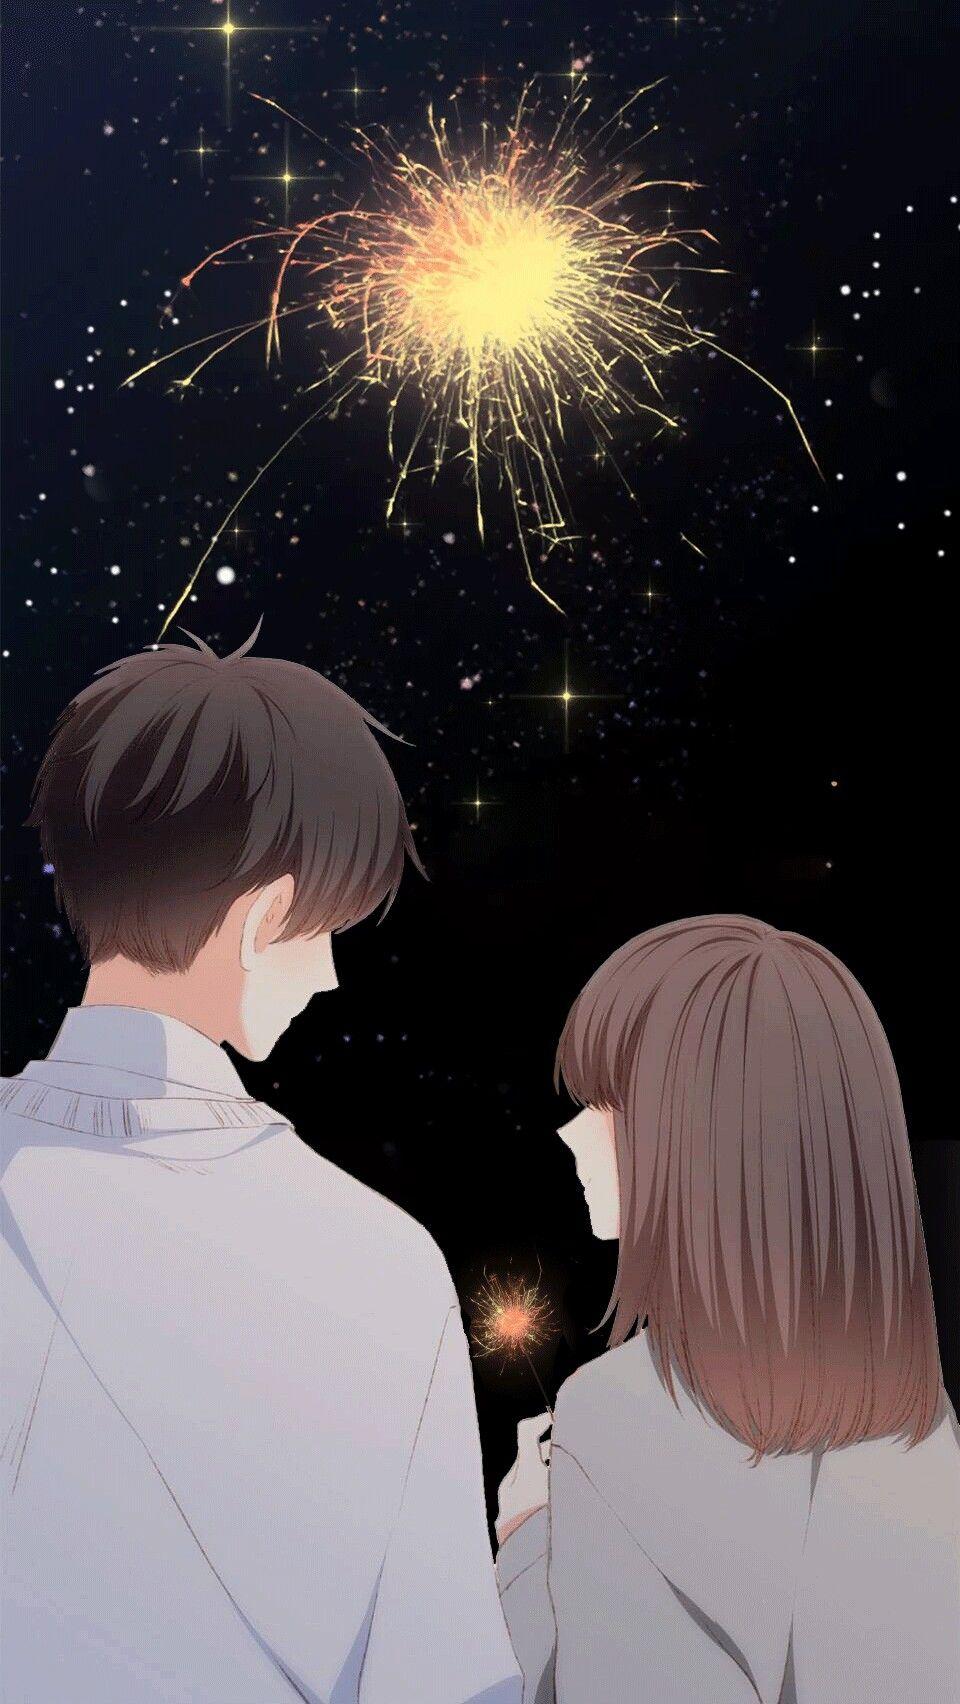 Pin Oleh Imelda Candra Di Wallpaper Ilustrasi Ilustrasi Kartun Gambar Anime